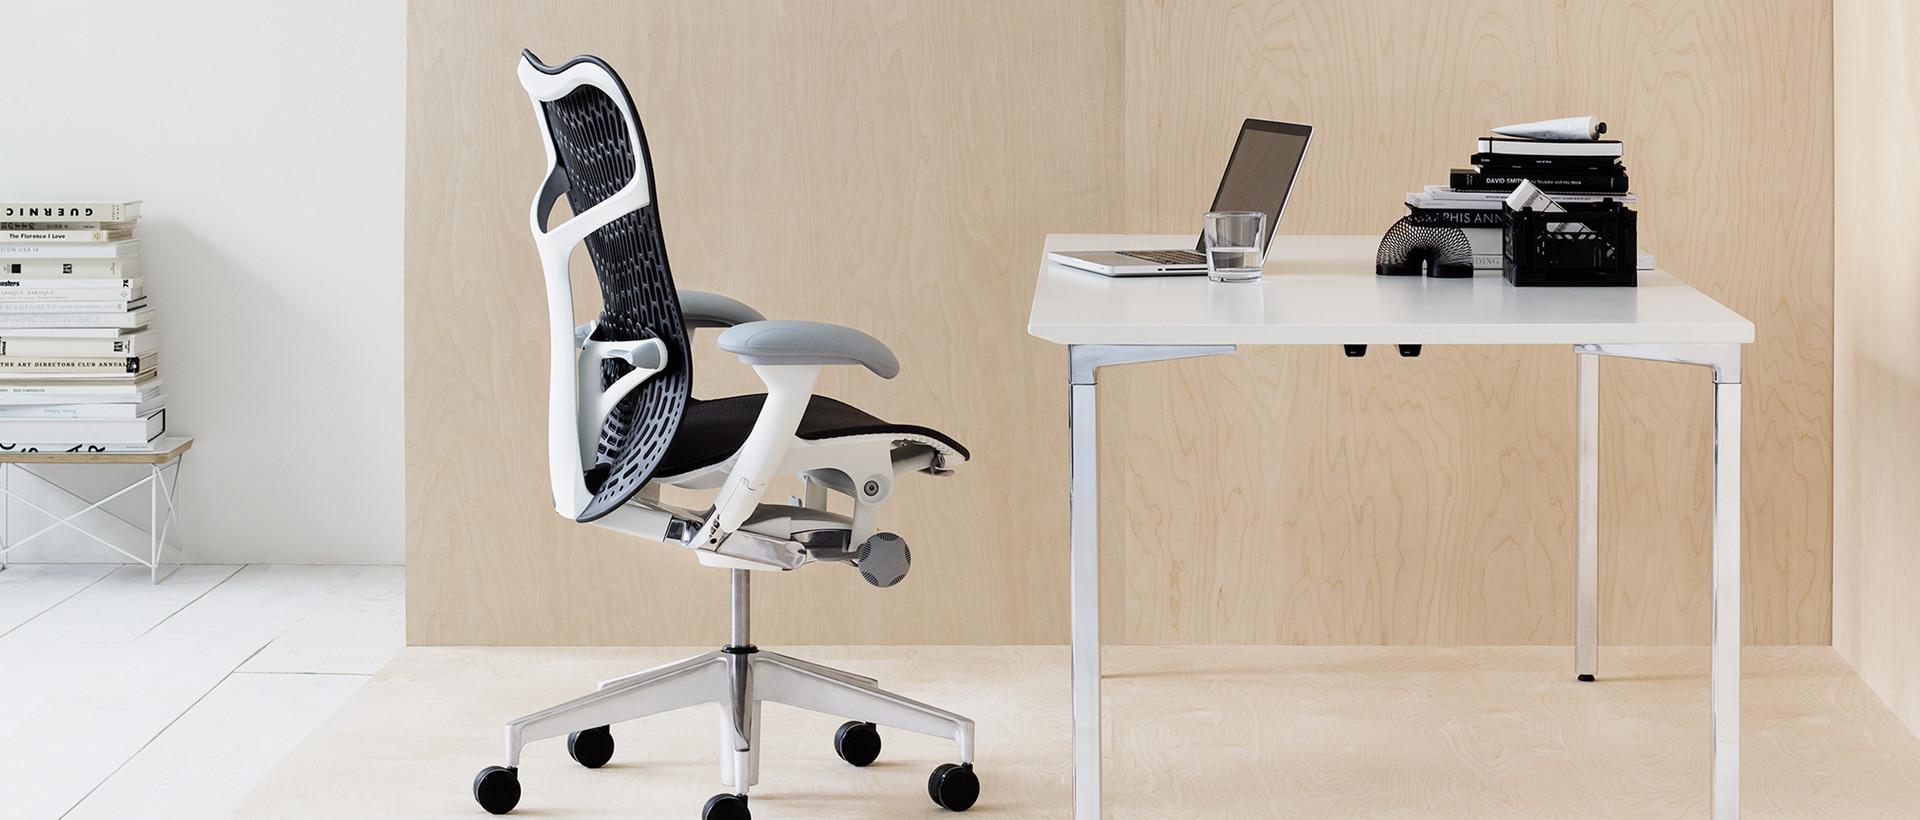 Bureaustoelen thuiswerkplek